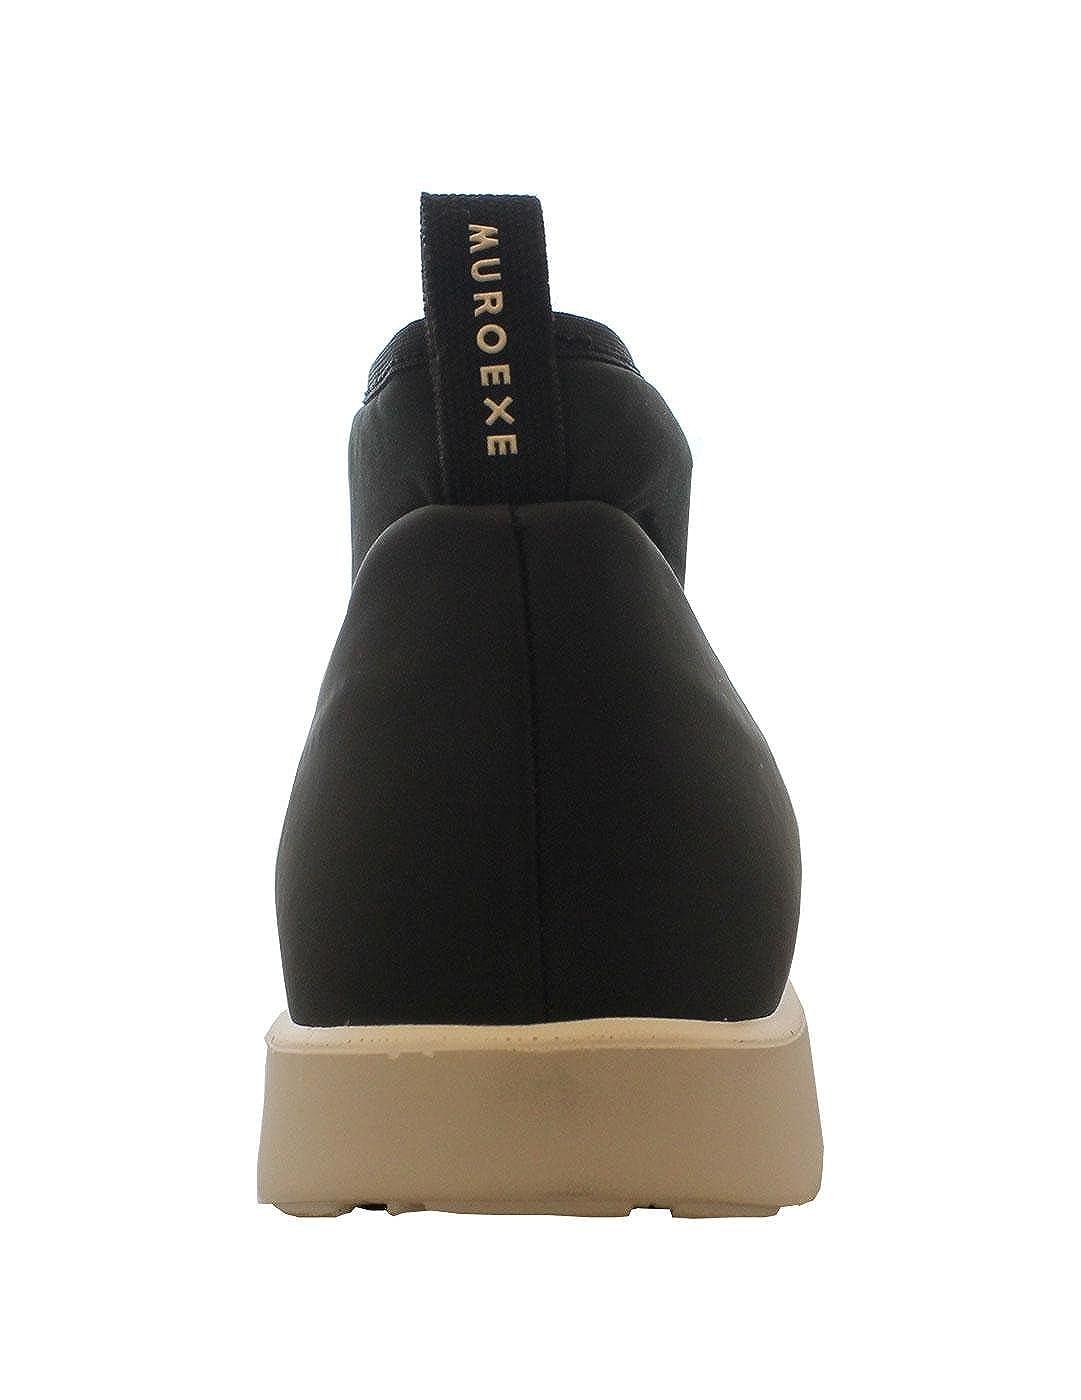 Muroexe Muro exe Zapatos Volcano PB Negro: Amazon.es: Zapatos y complementos